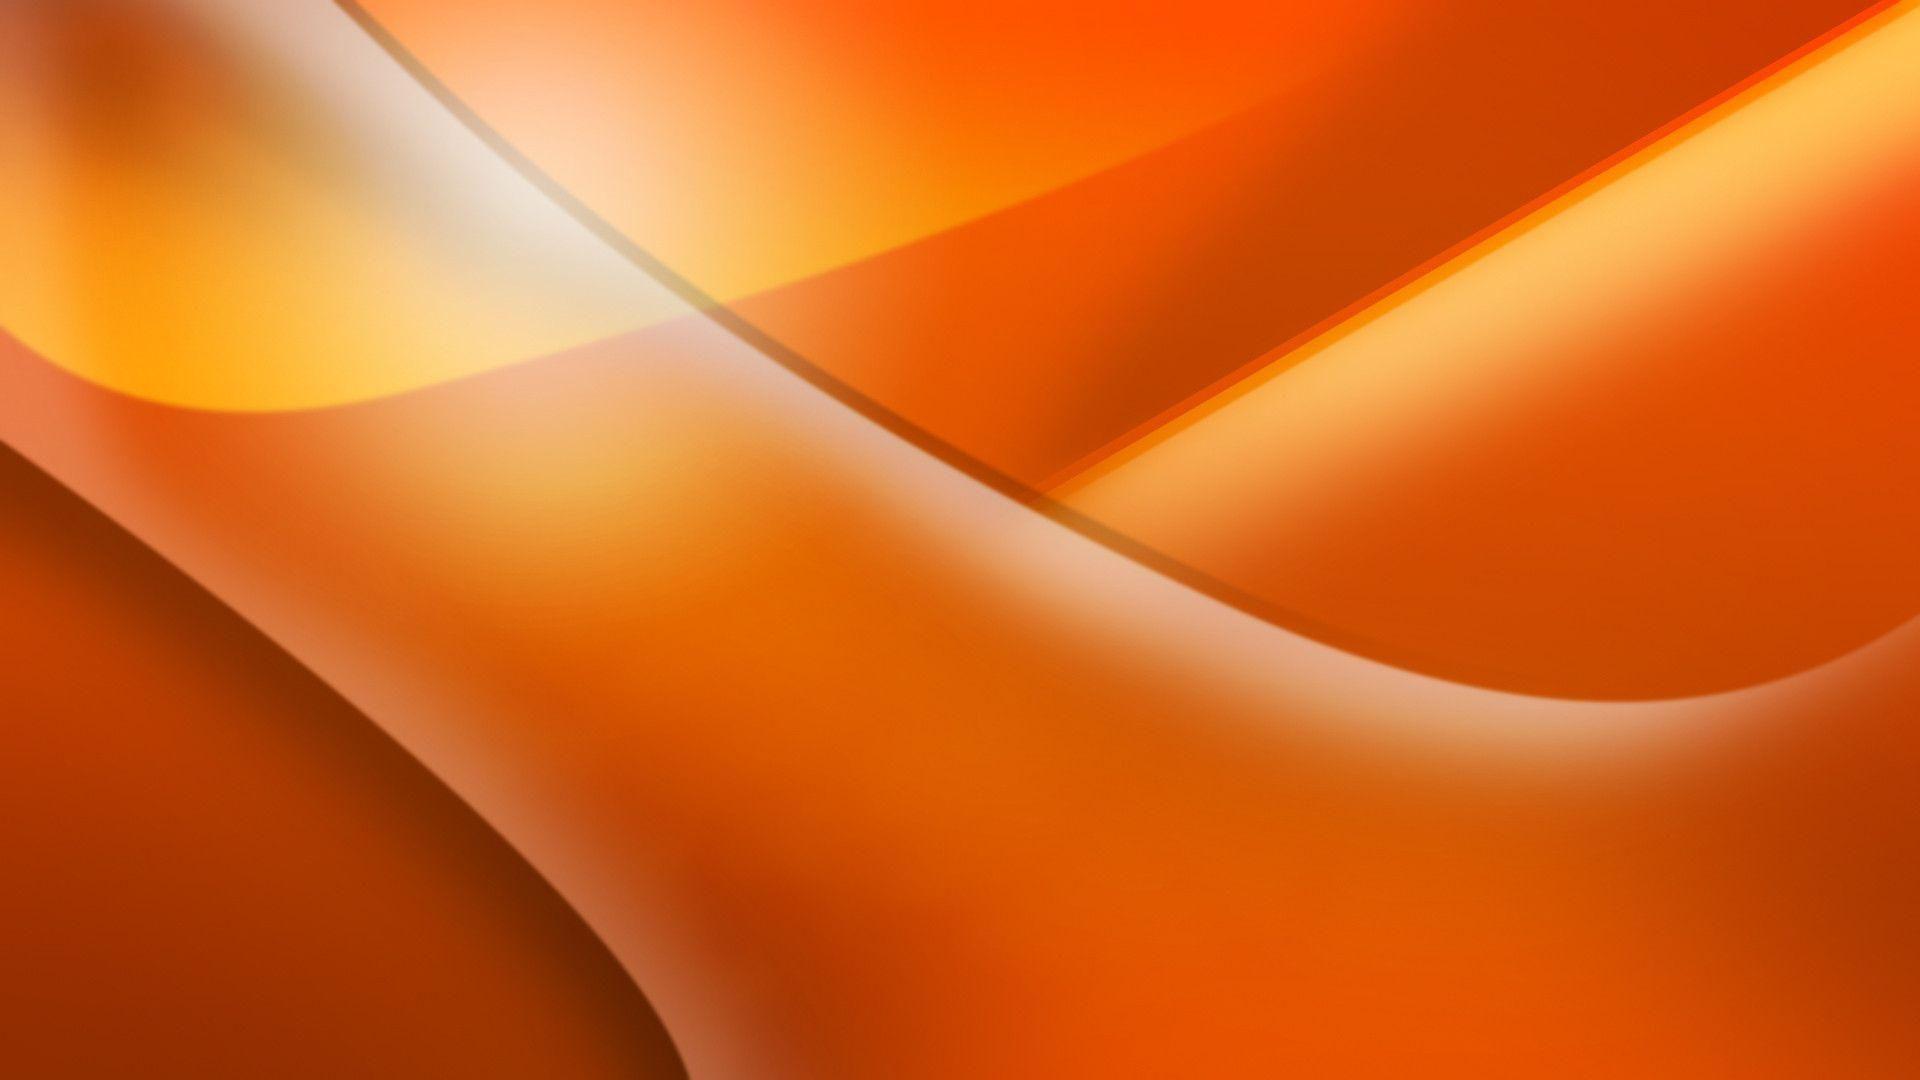 Orange screen wallpaper